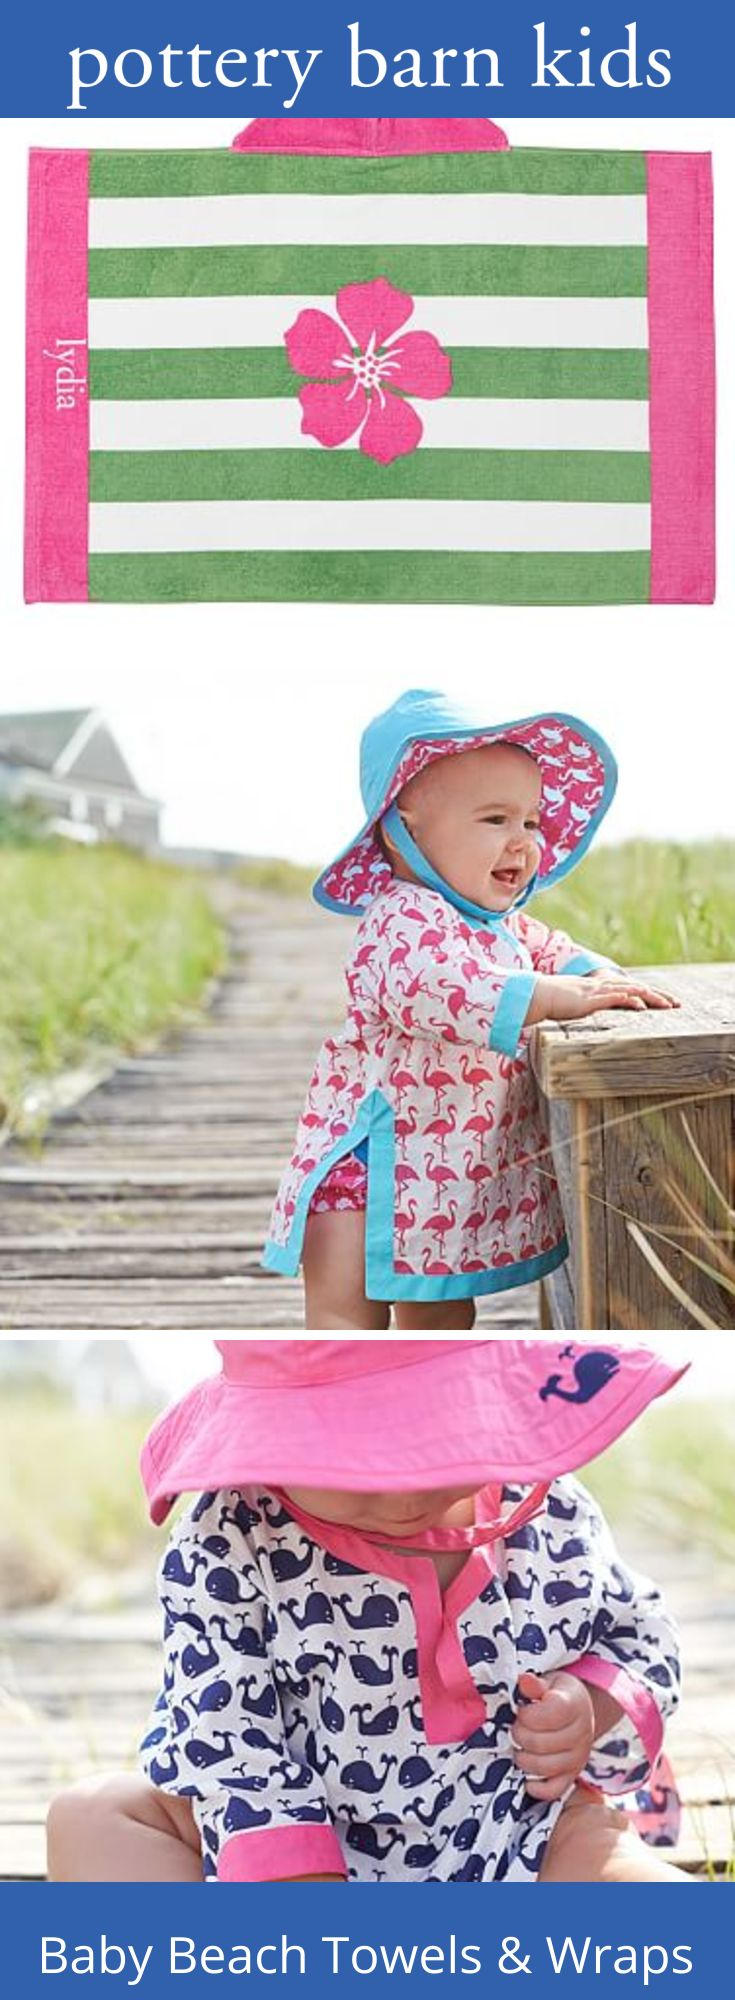 Baby Beach Towels & Wraps